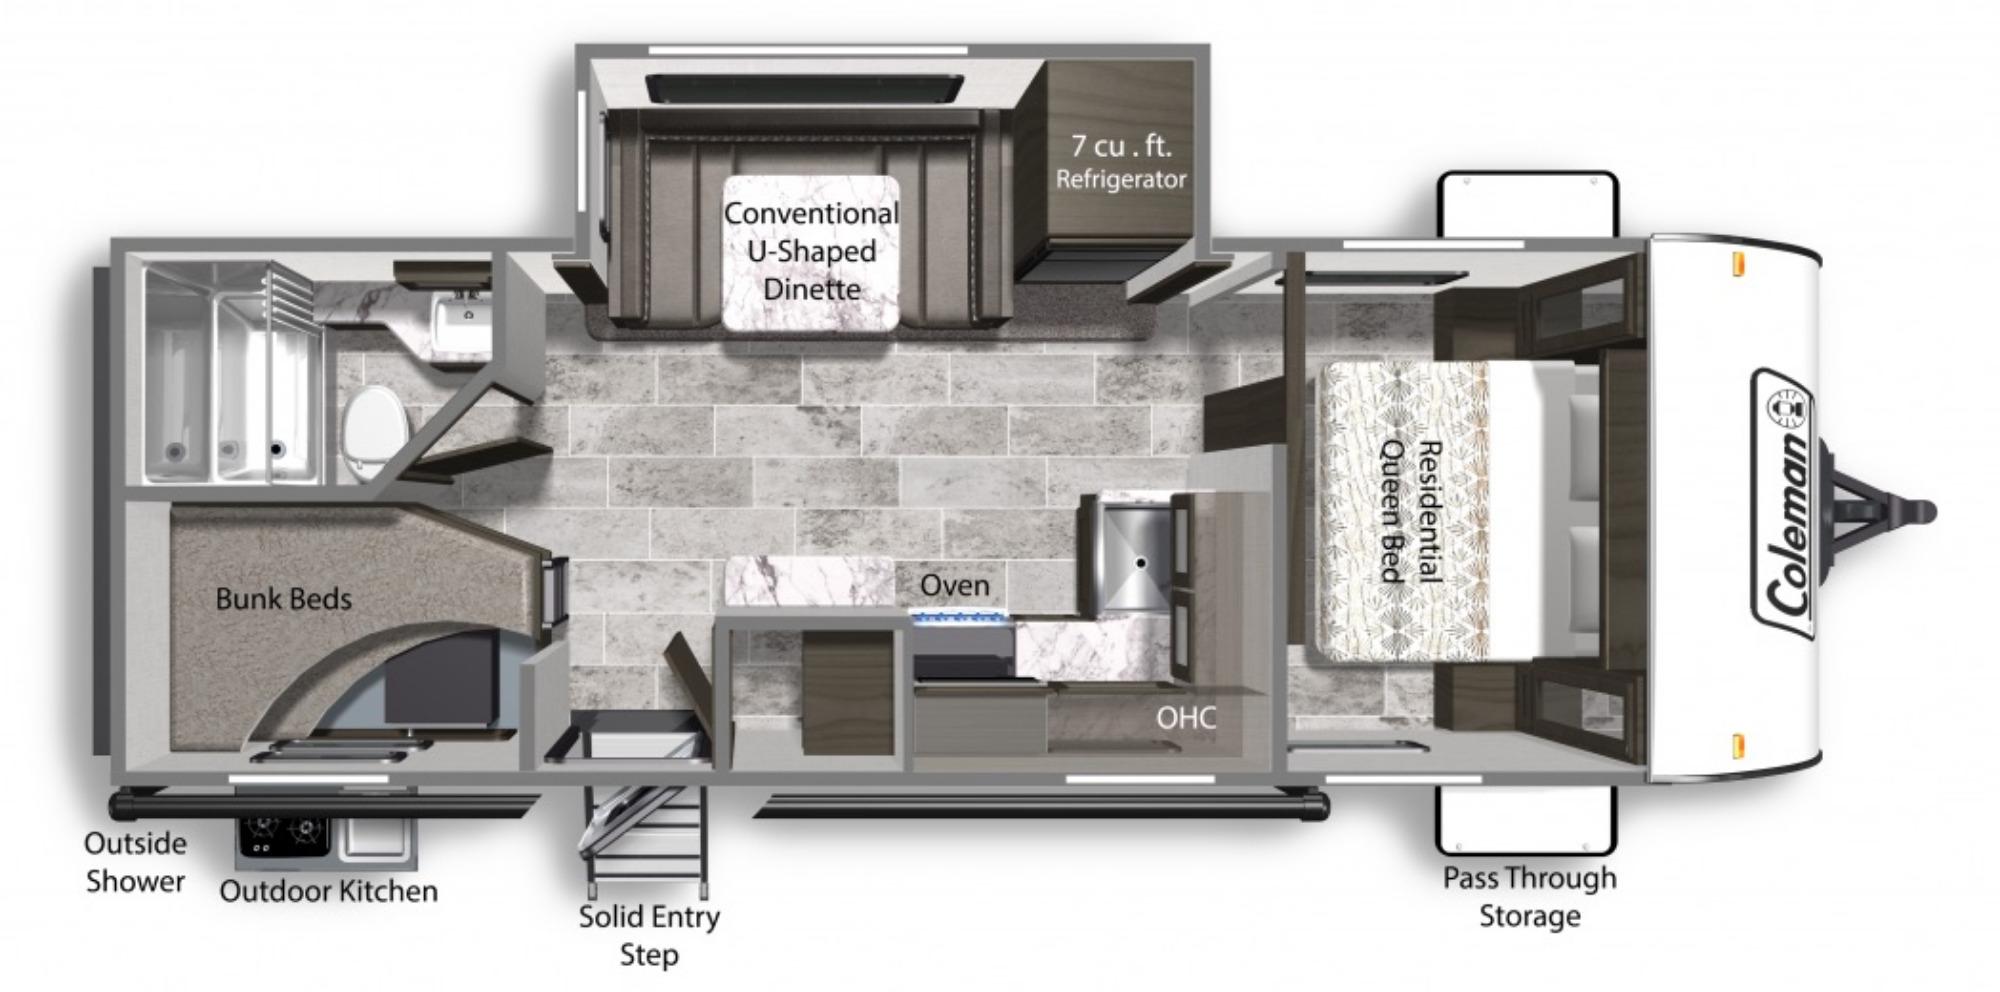 View Floor Plan for 2022 COLEMAN COLEMAN LIGHT 2455BH